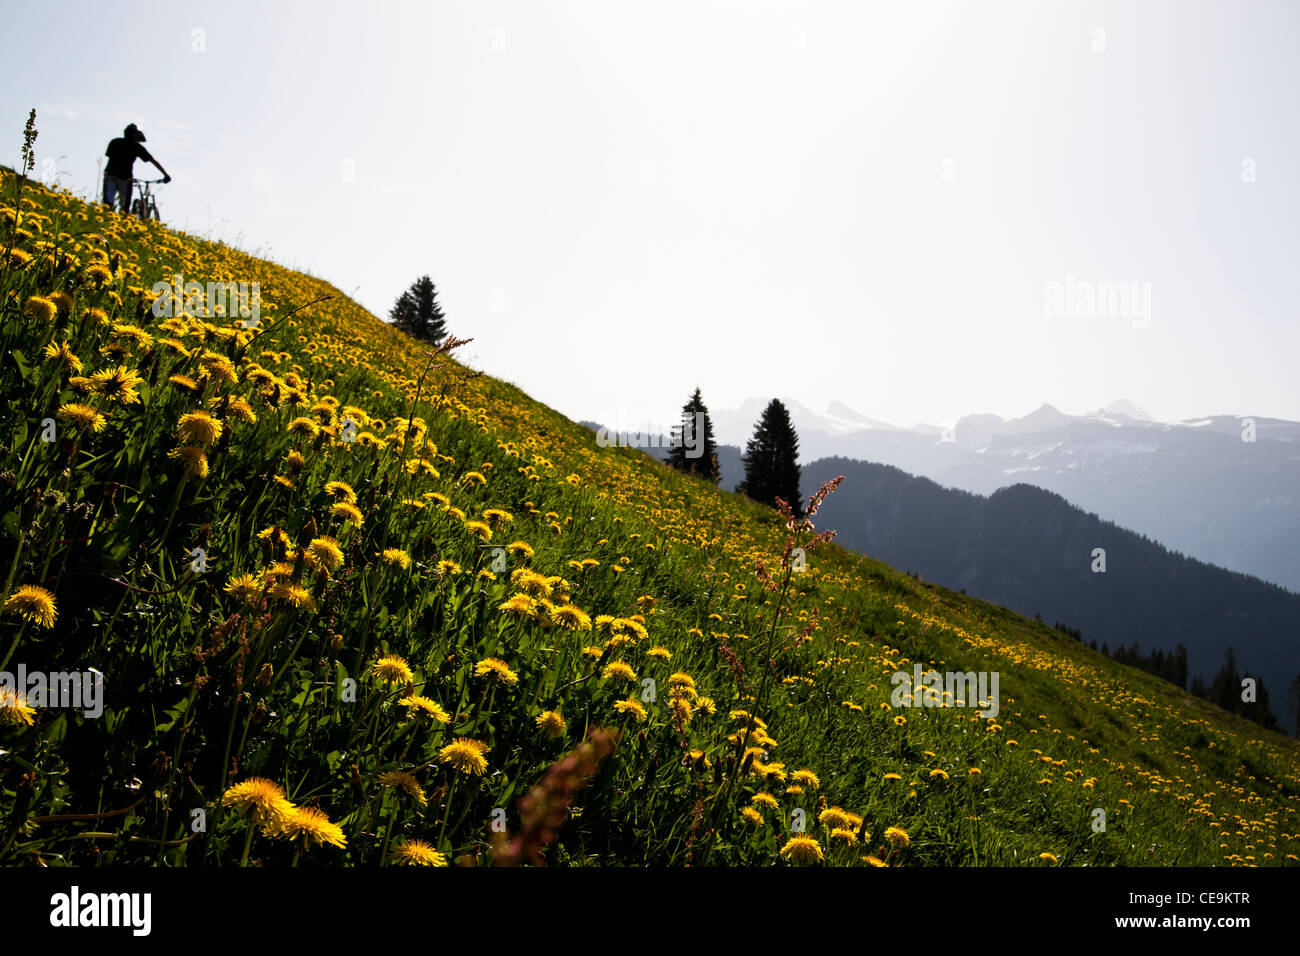 Mountainbiker walking his bike up the hill with flowerfield in foreground, Interlaken, Switzerland - Stock Image